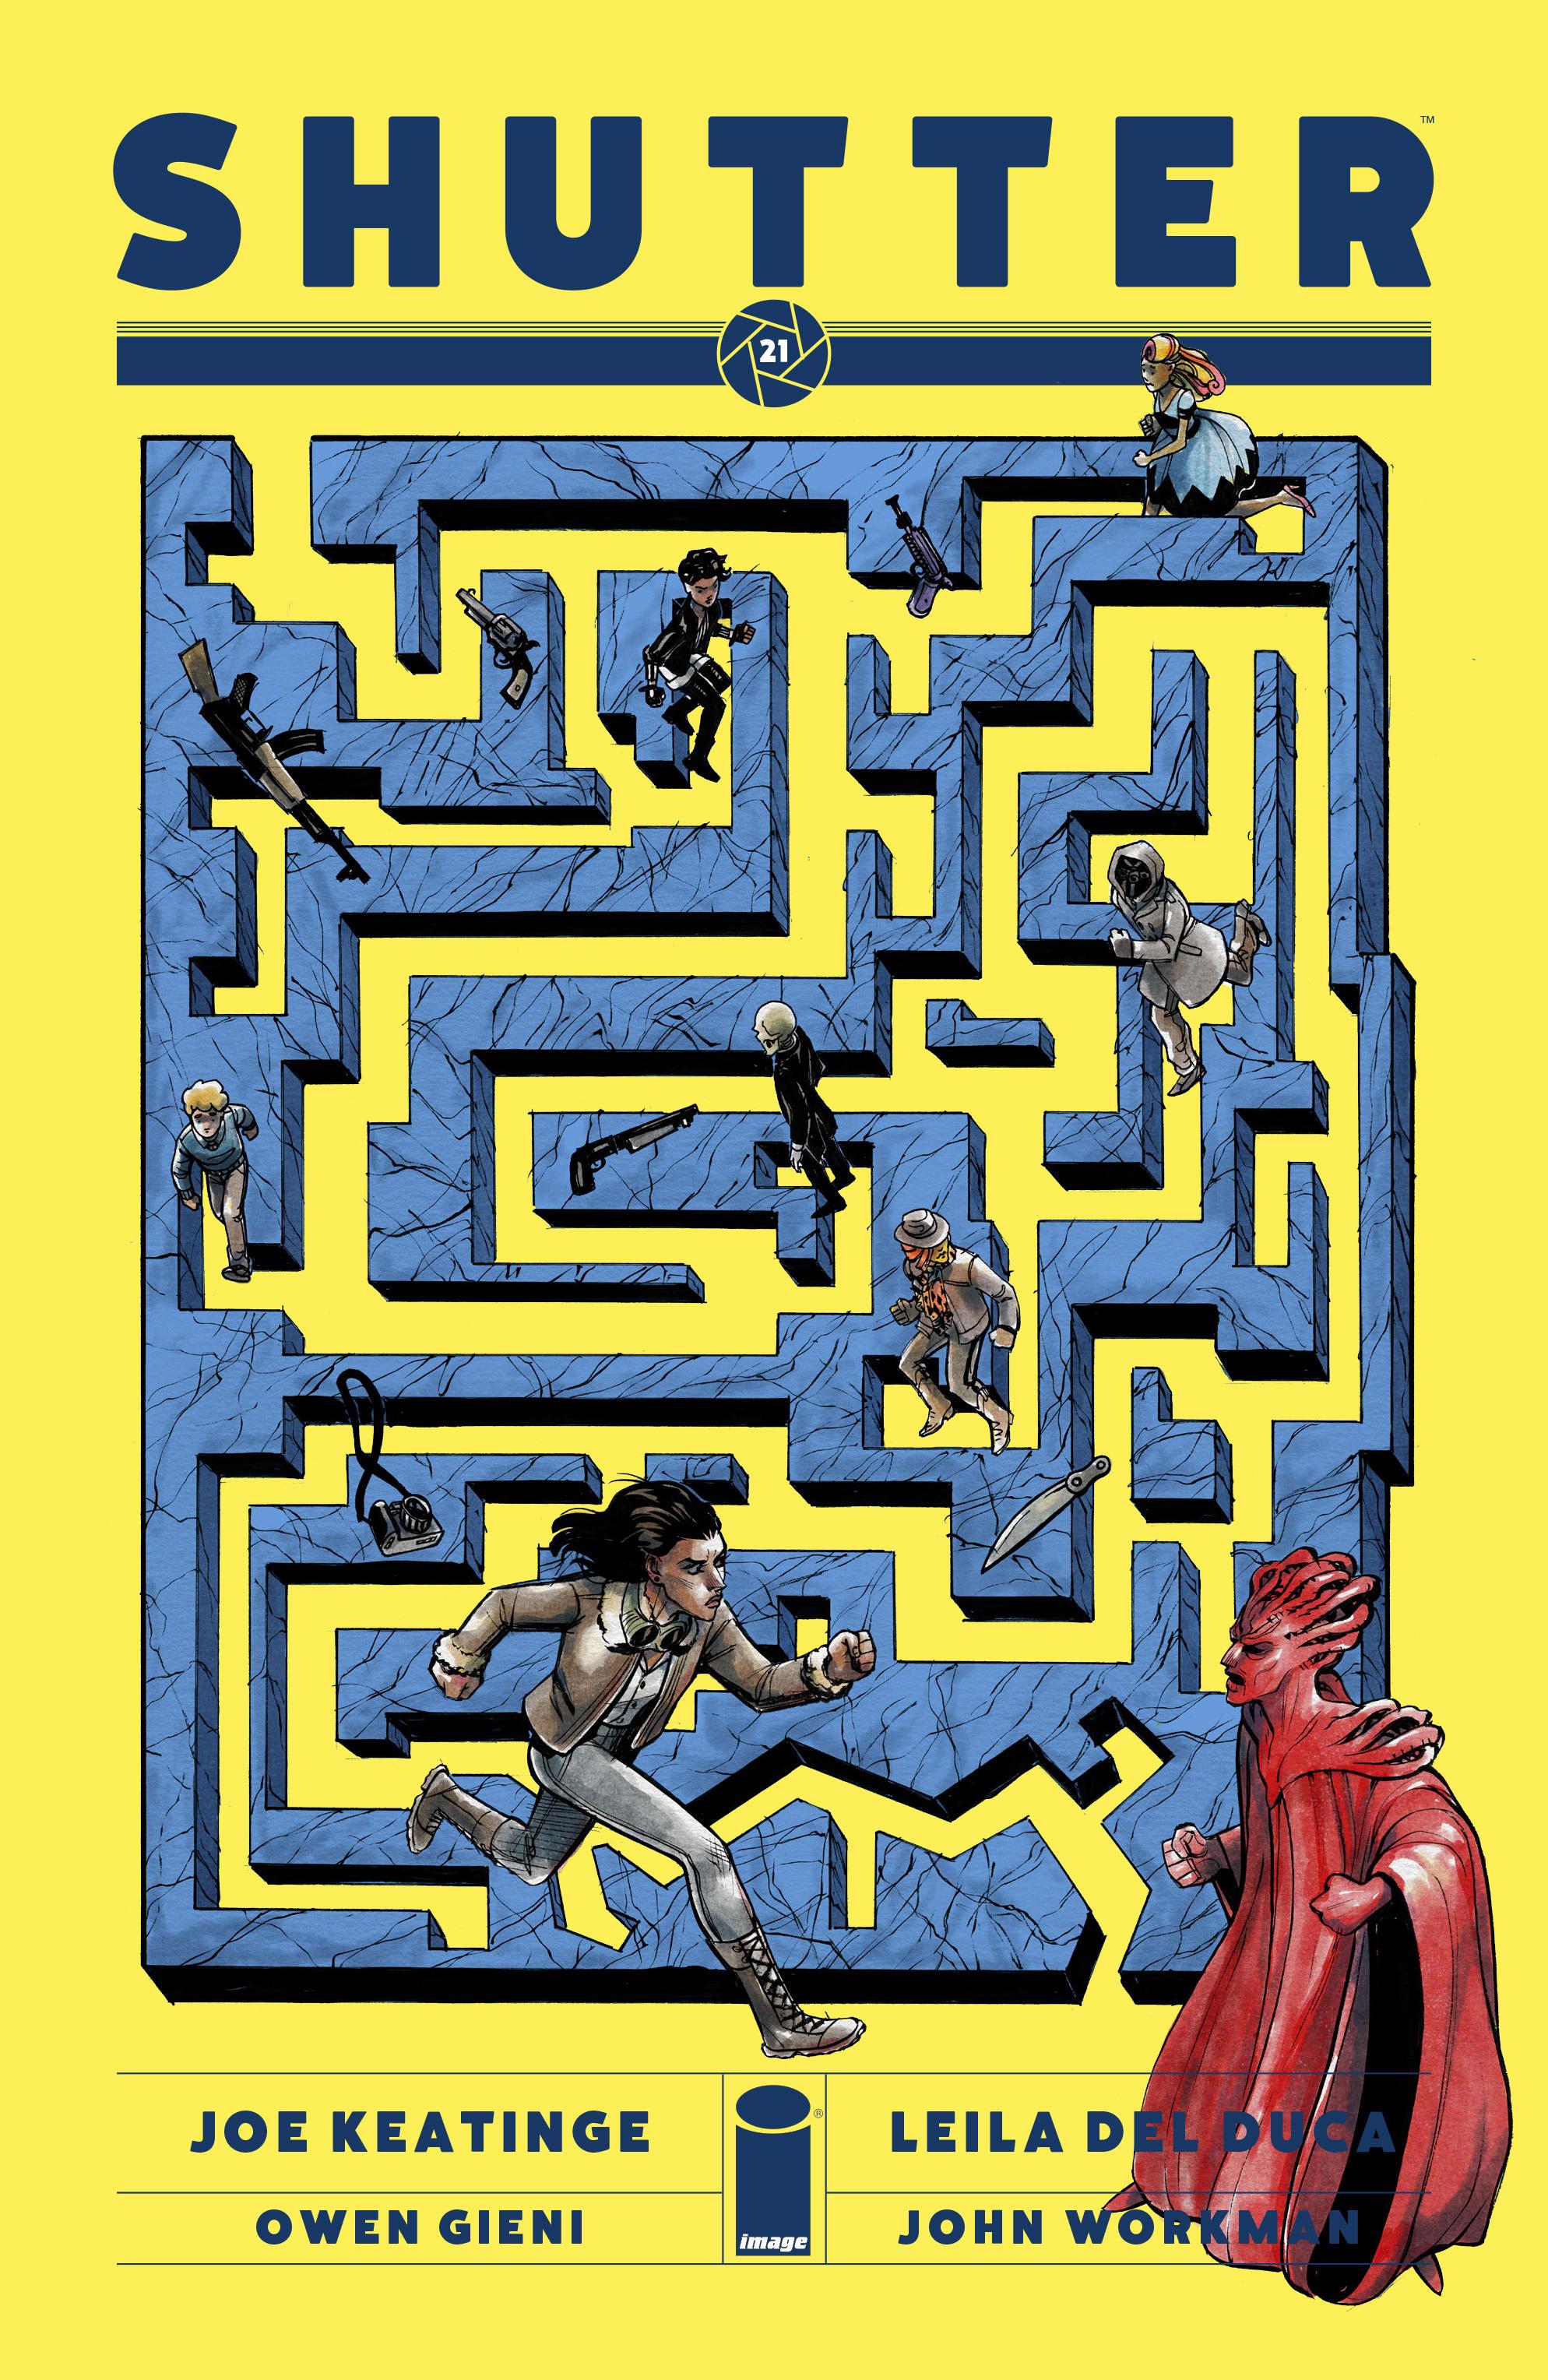 Read online Shutter comic -  Issue #21 - 1